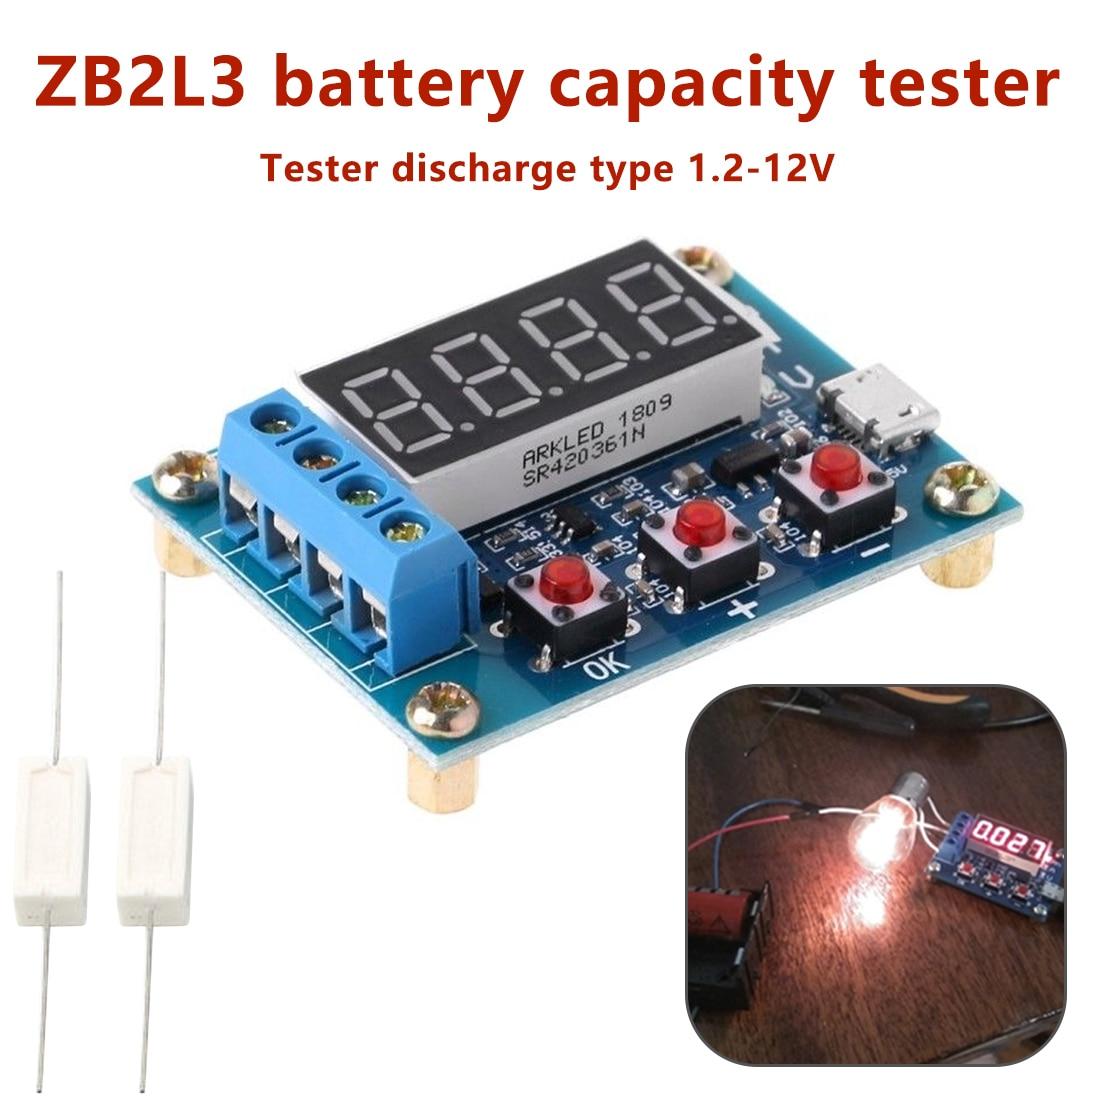 Verificador de descarga zb2l3 do analisador do indicador de carregamento 1.2-12 v da bateria do verificador da capacidade da bateria do chumbo-ácido da bateria do lítio